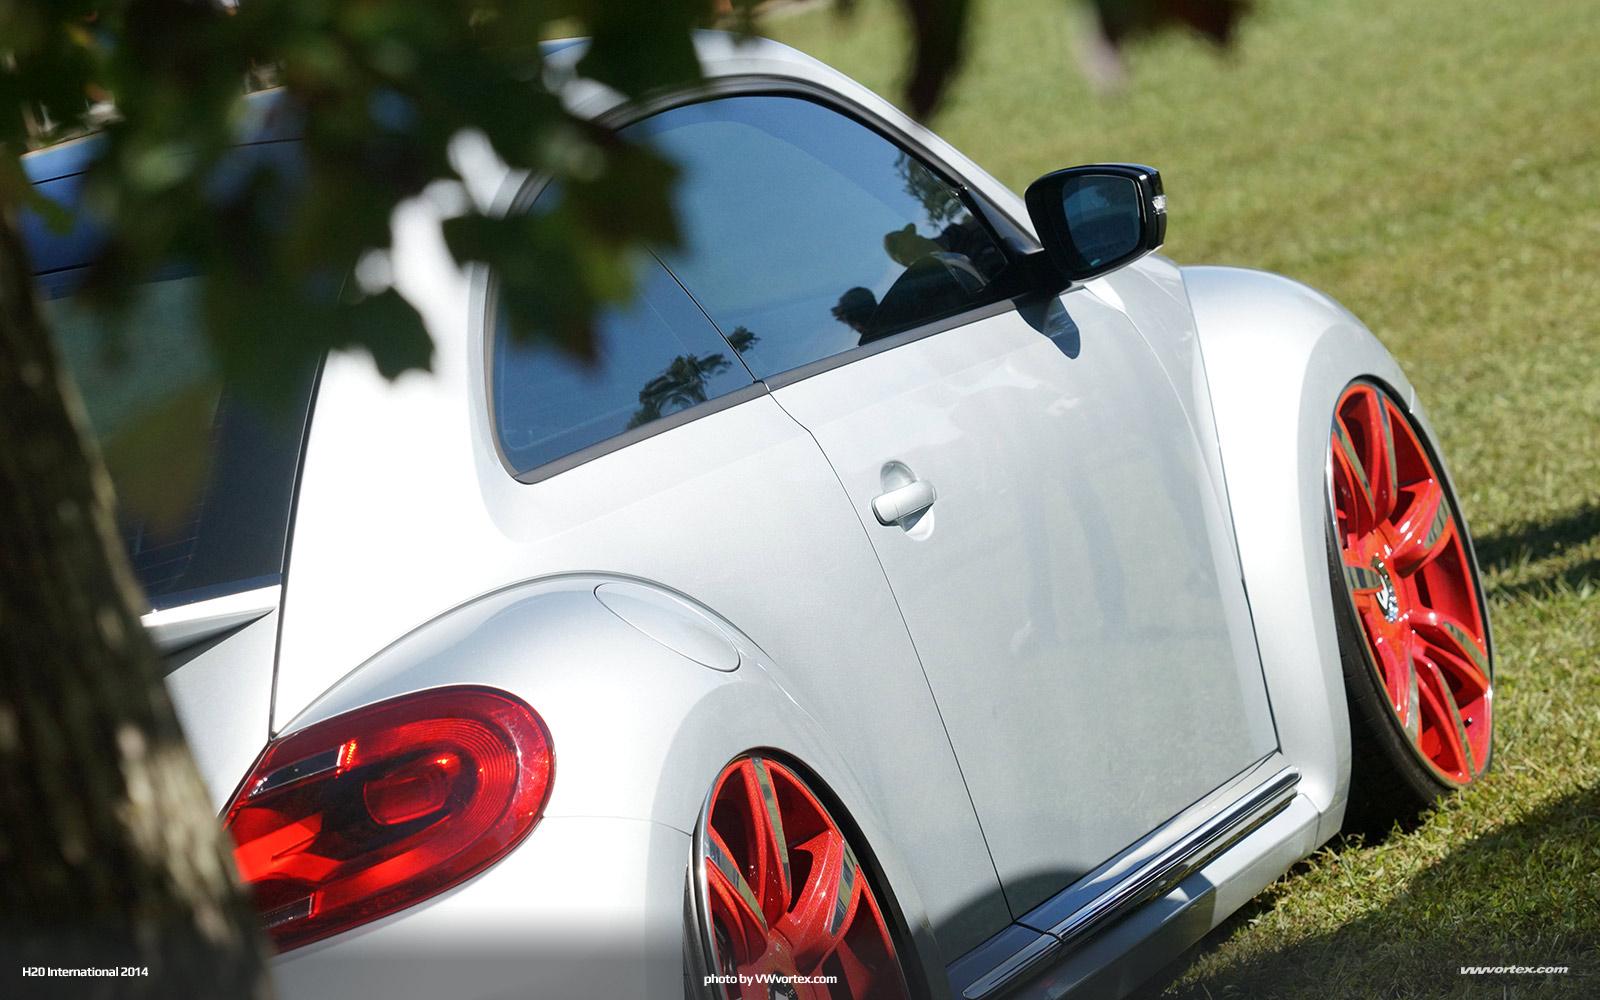 2014-H20i-H20-International-VW-Volkswagen-Audi-324